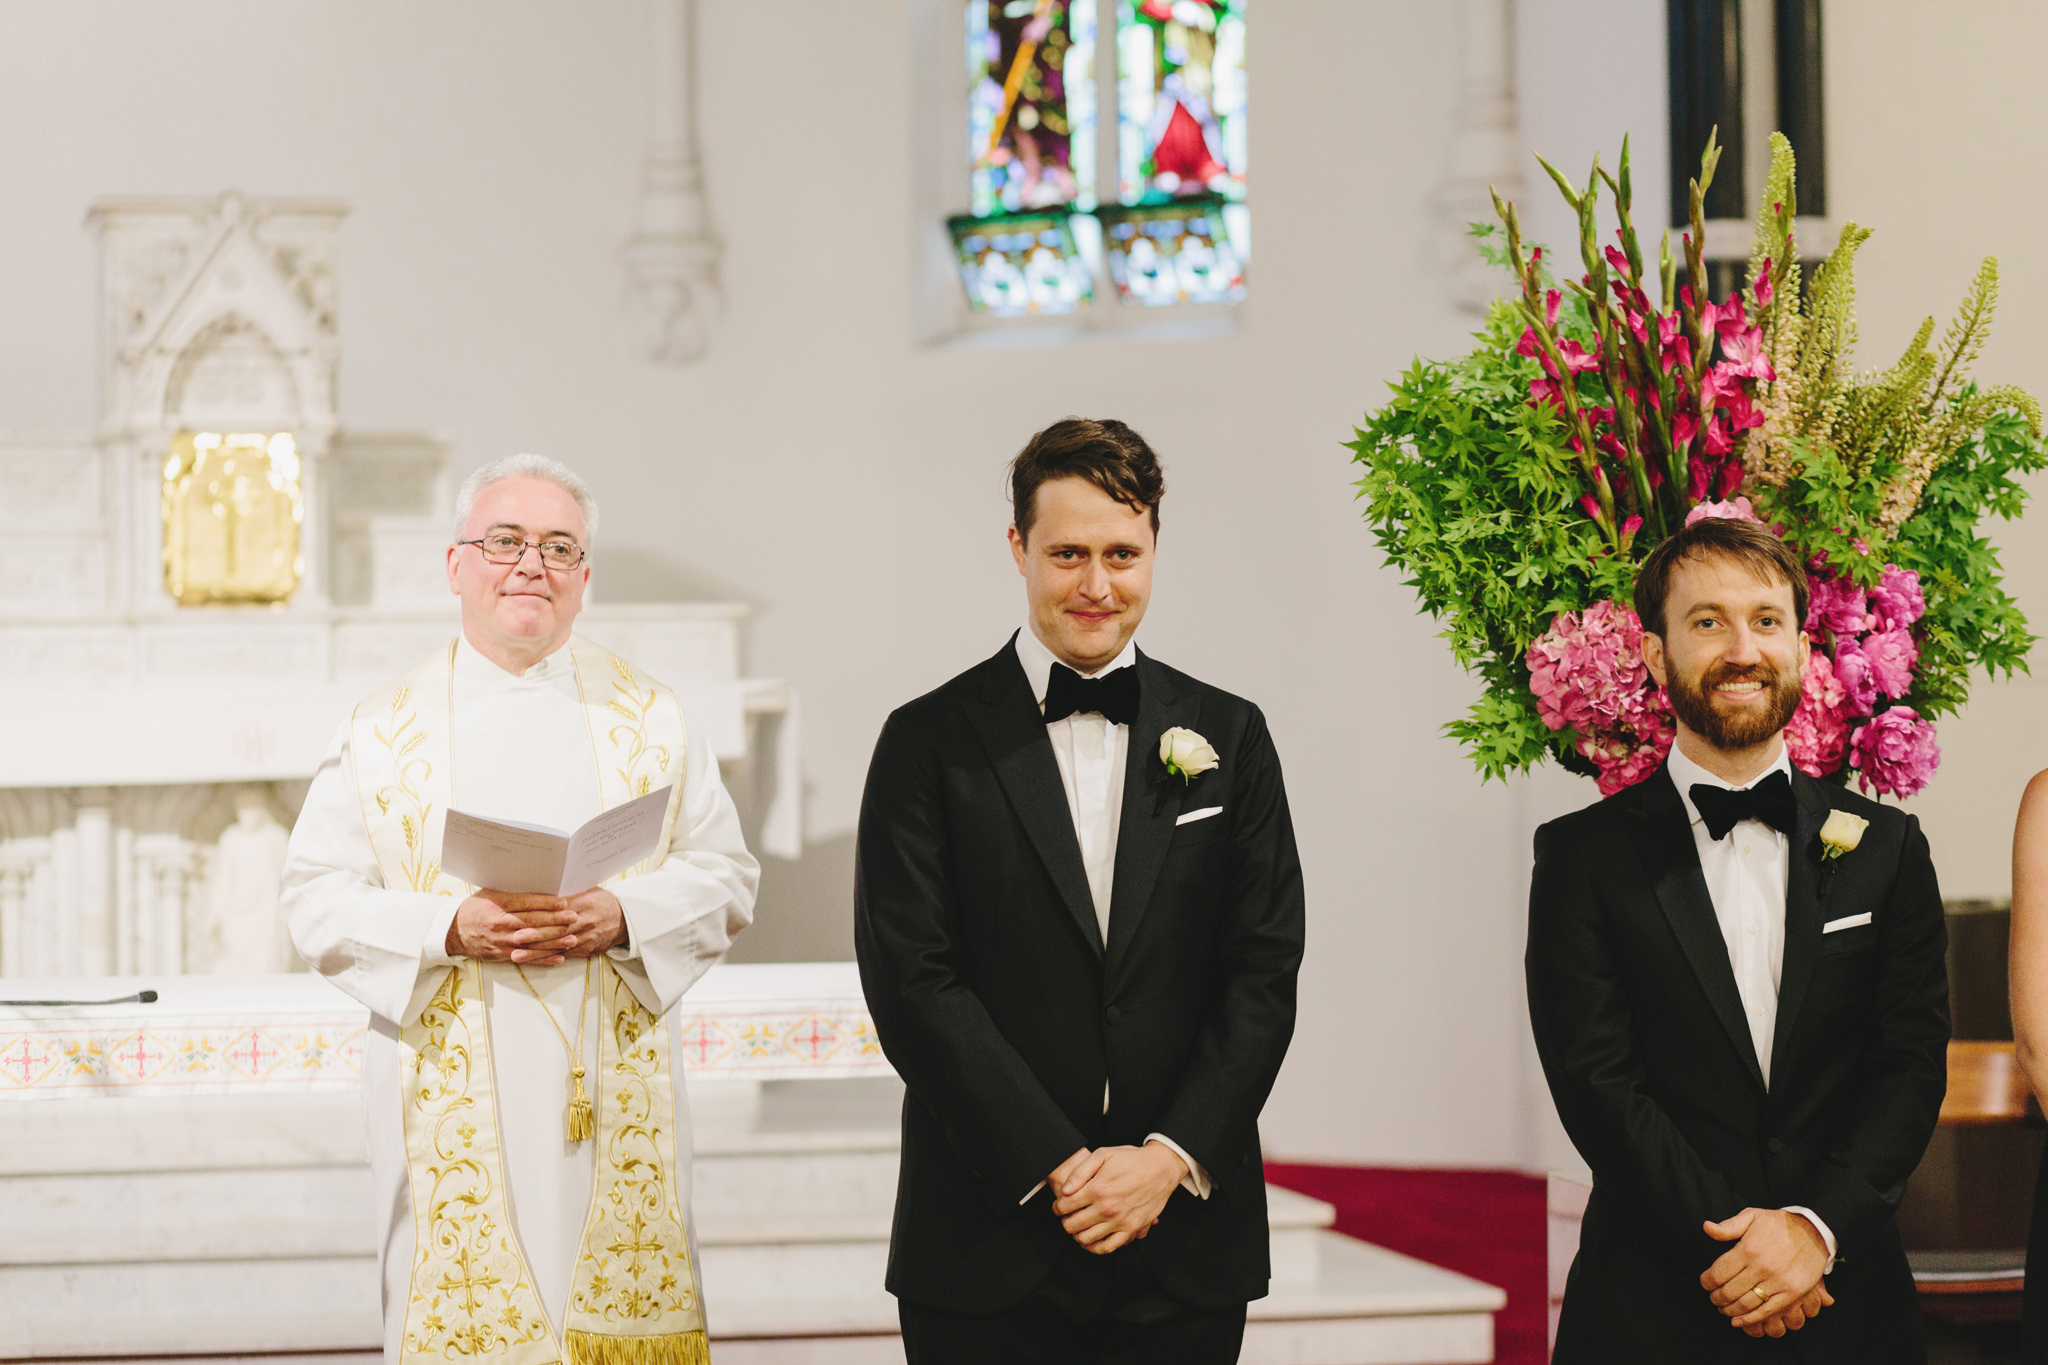 Abbotsford_Convent_Wedding_Peter_Anna049.JPG